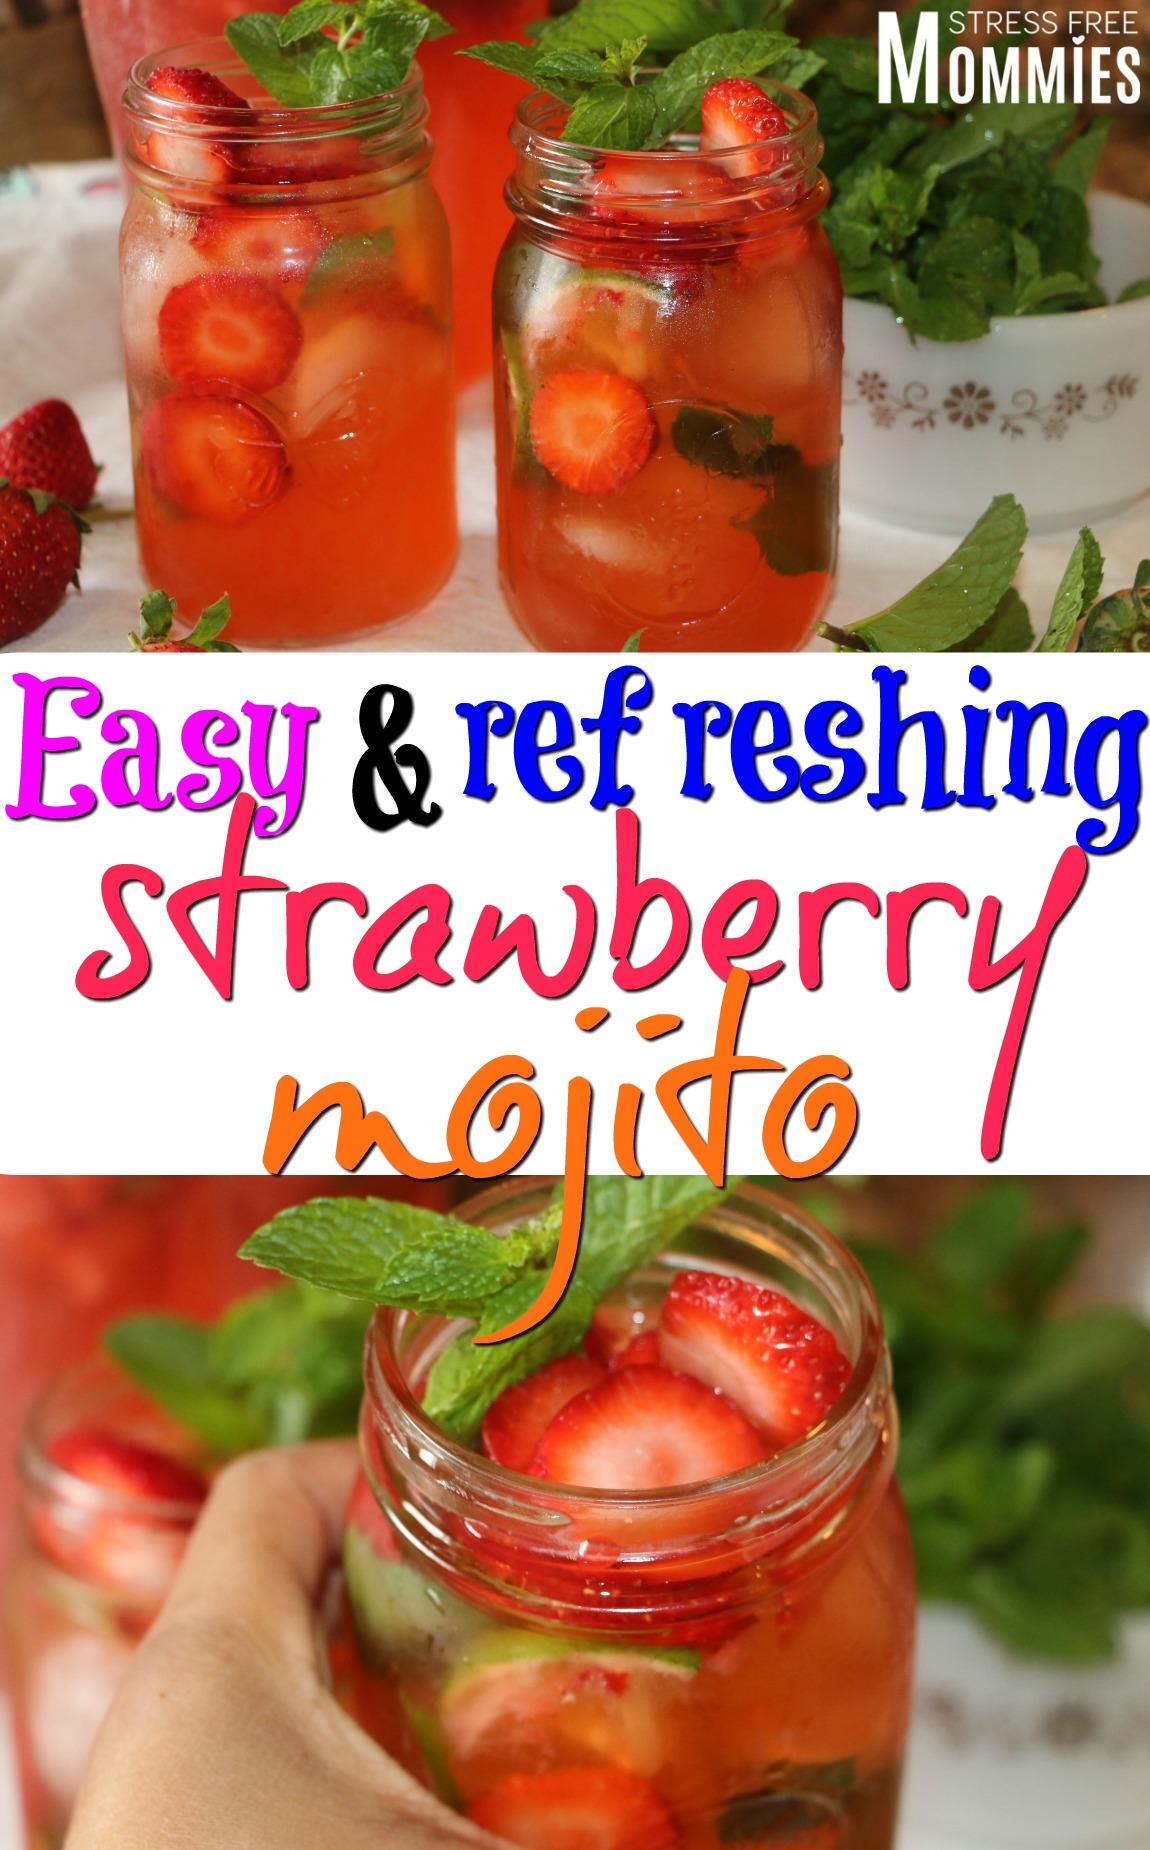 Easy and refreshing strawberry mojitos